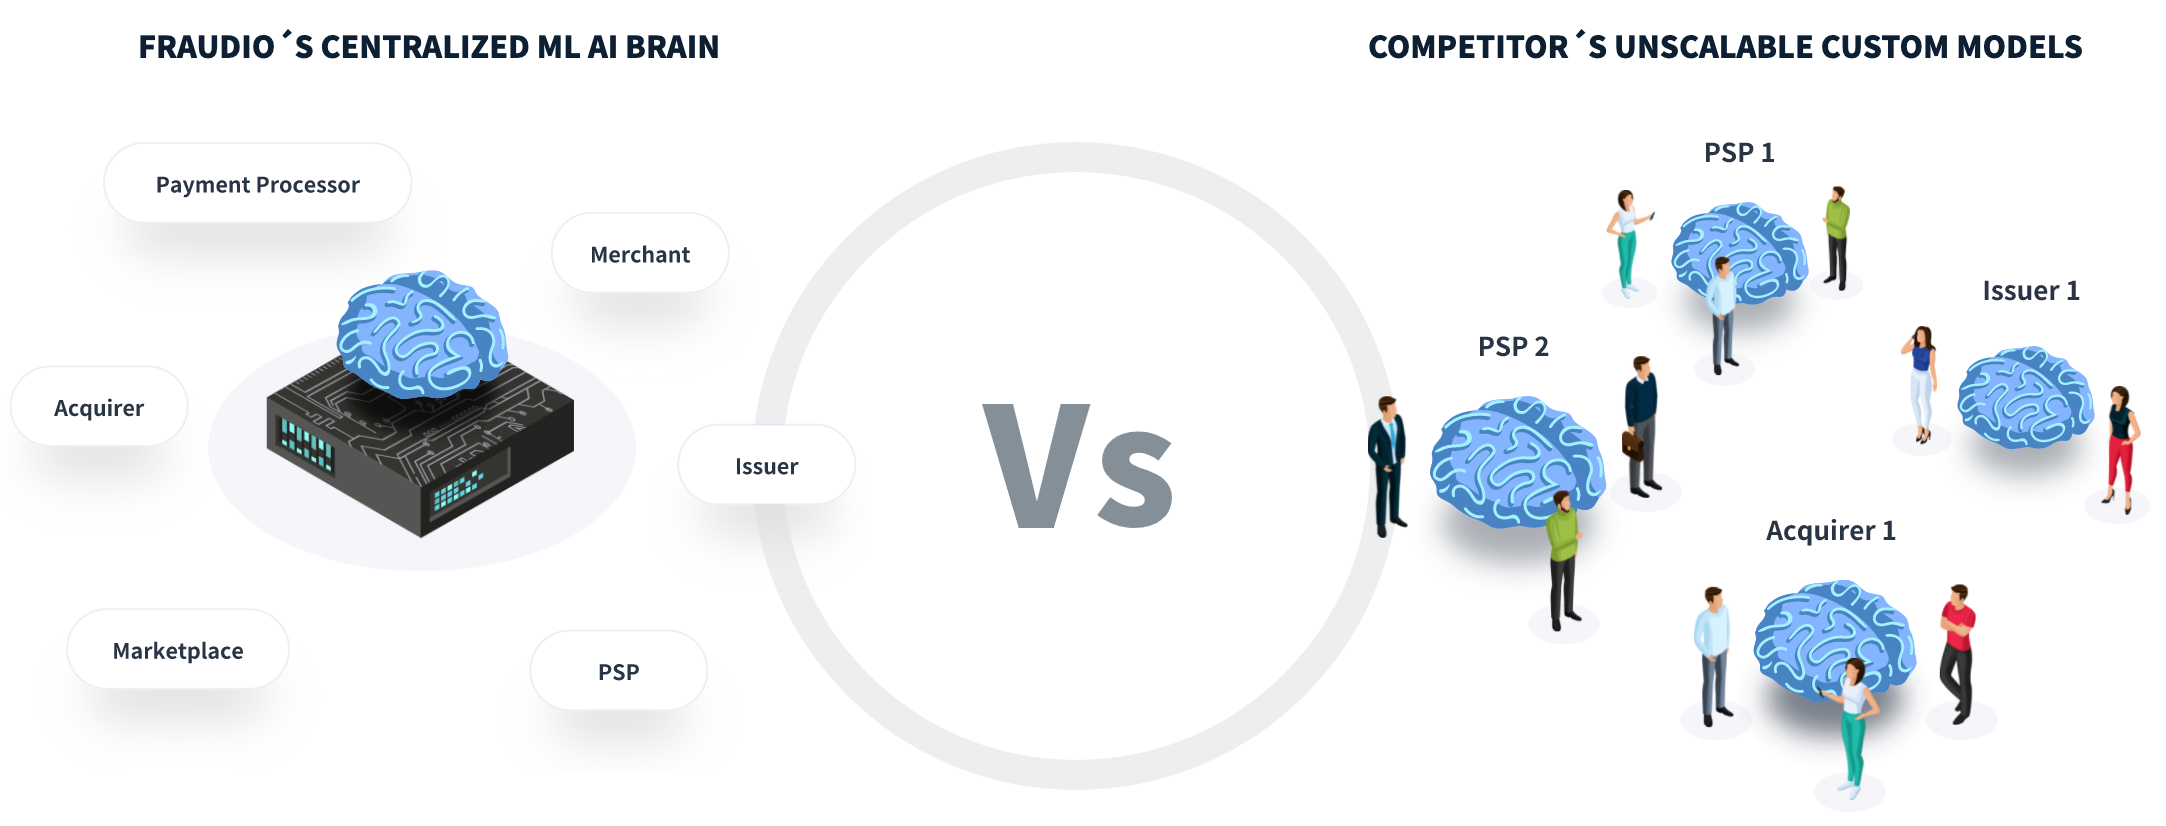 Fraudio vs Competitors